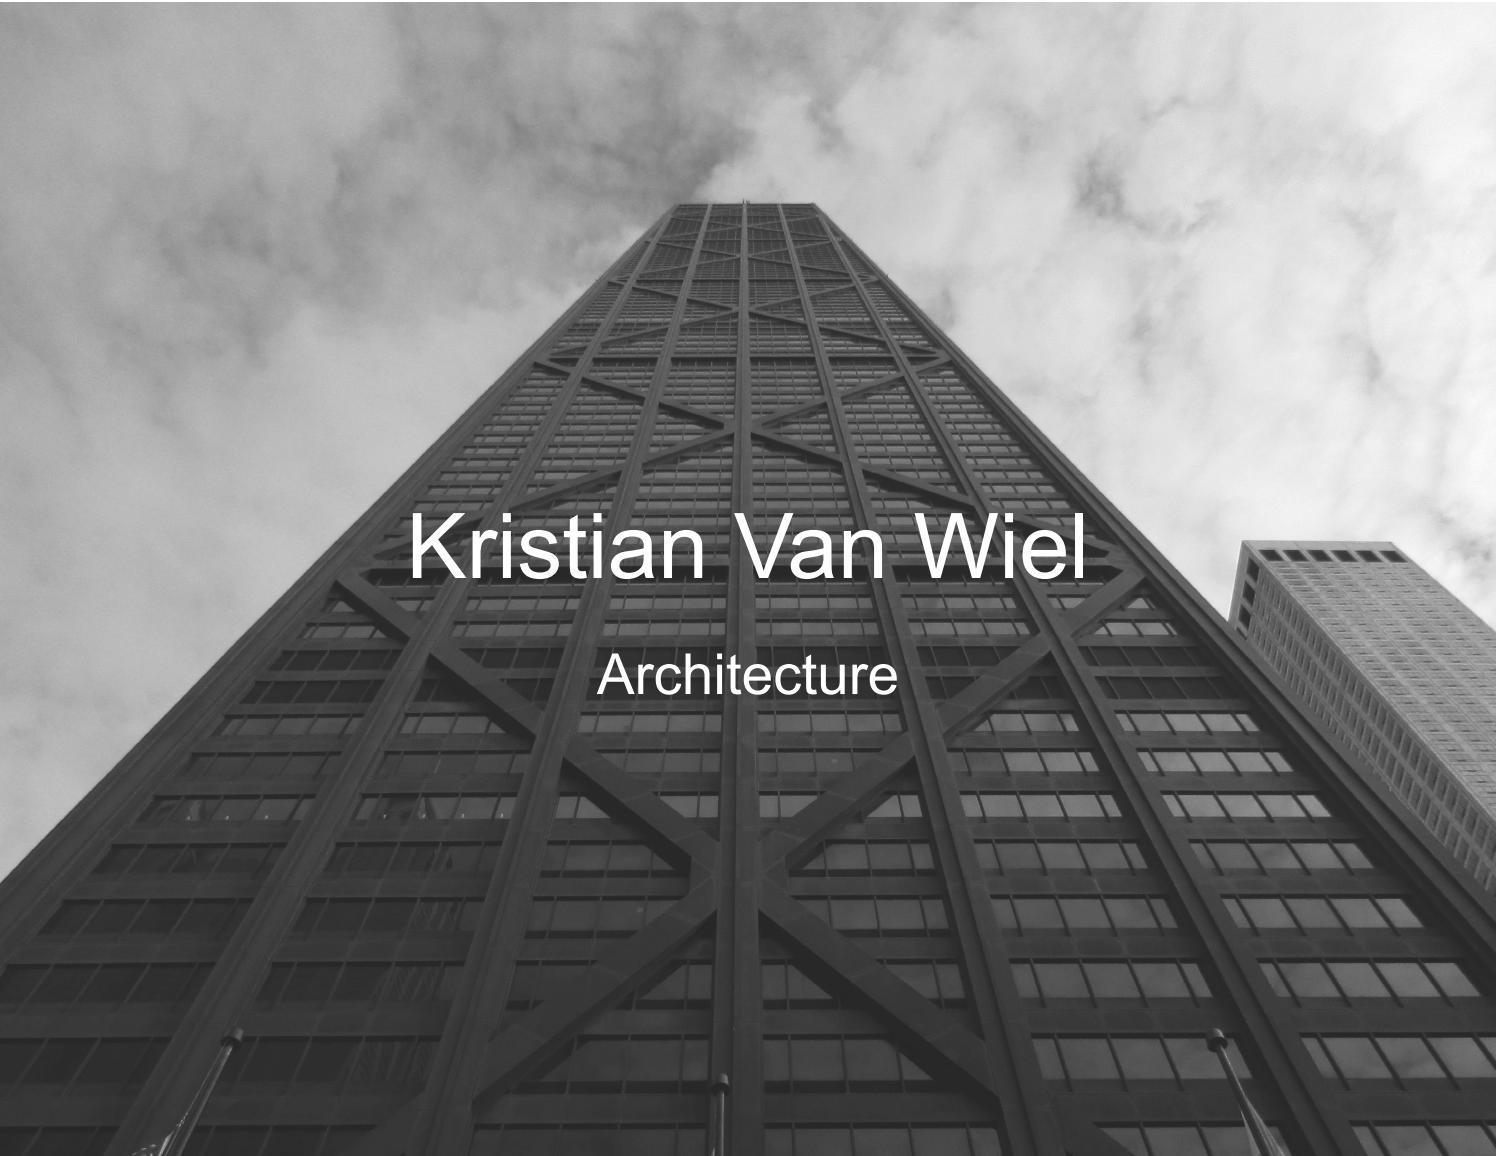 Kristian Van Wiel Architectural Portfolio by Kristian Van